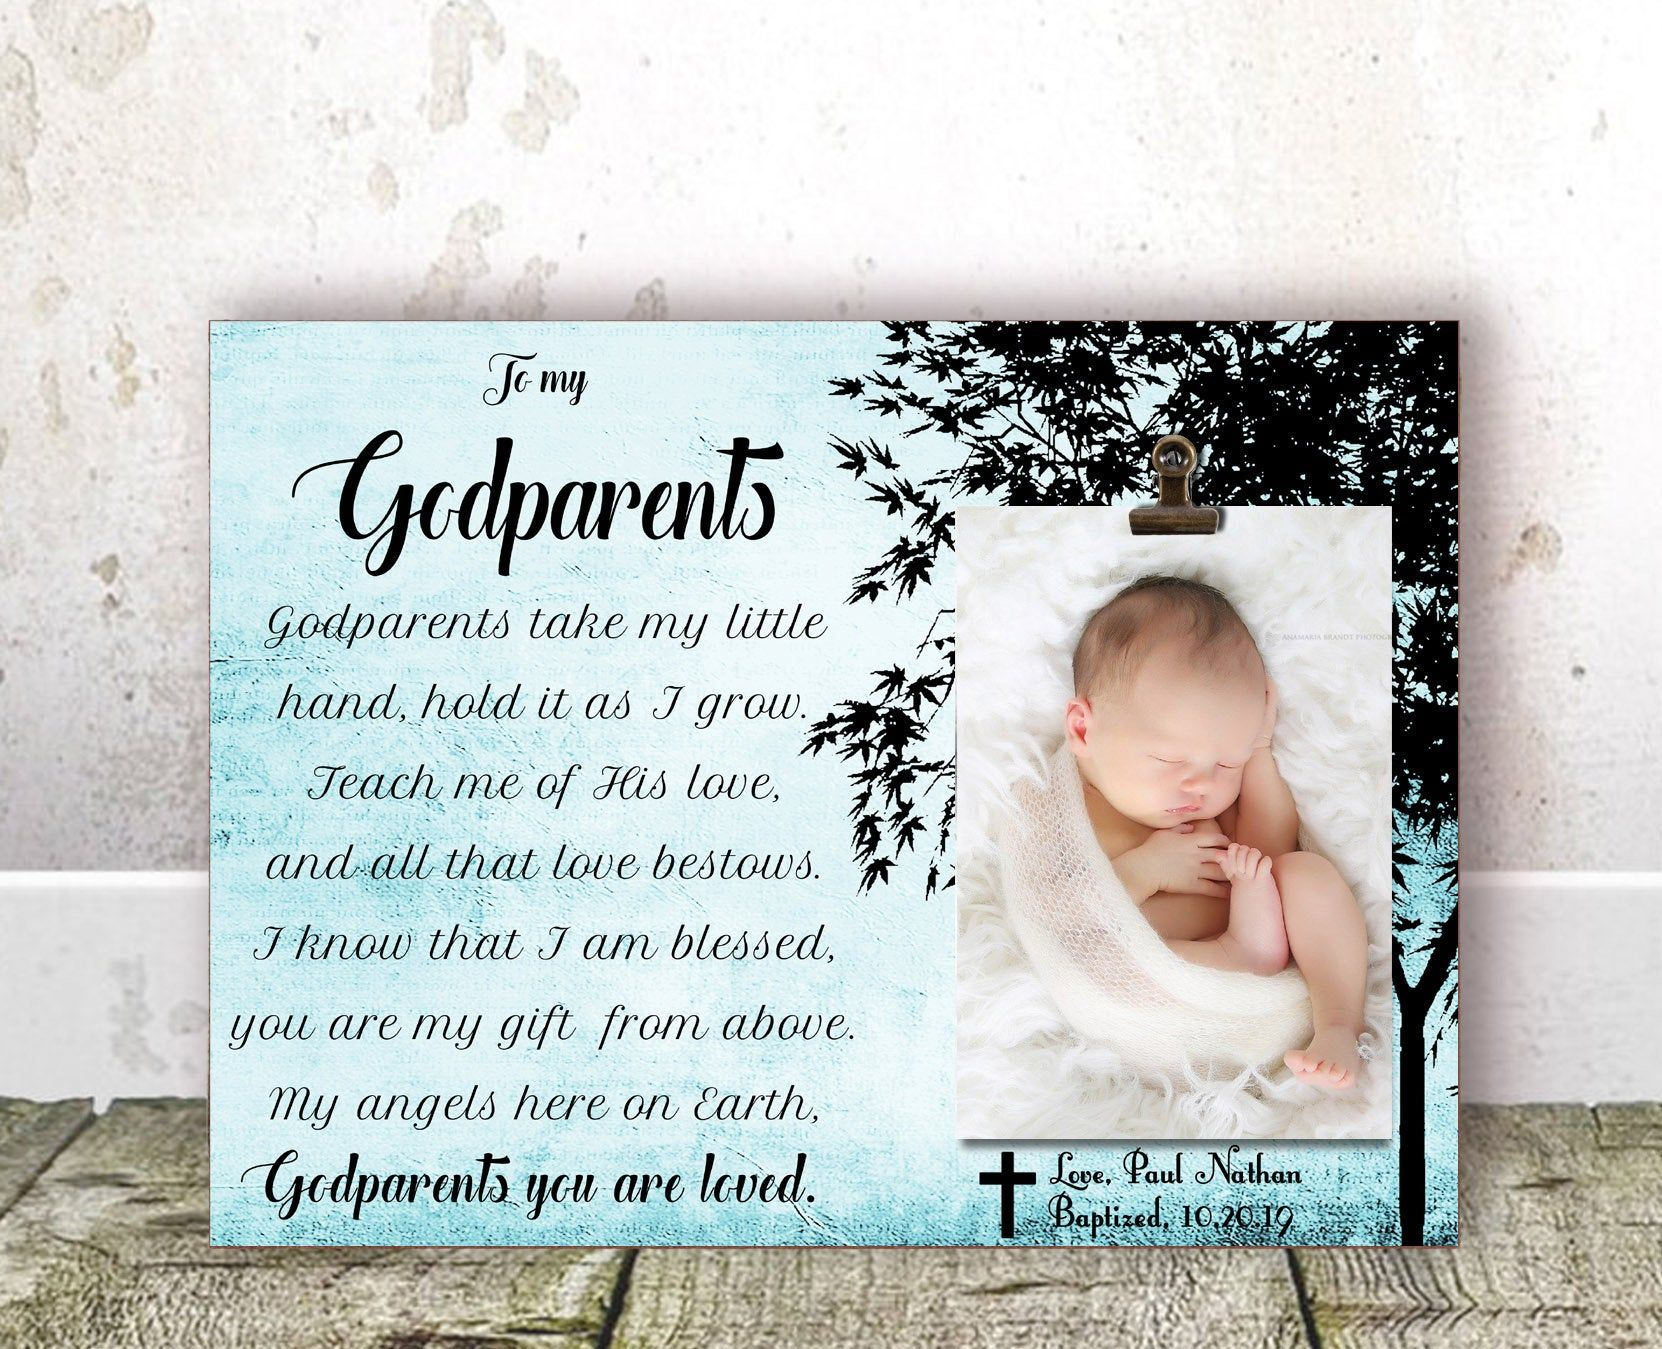 Godmother Gift for Godmother Baptism Gift Godmother Christening Gift Godmother Frame Godparents gift from Godchild Personalized Frame Aunt